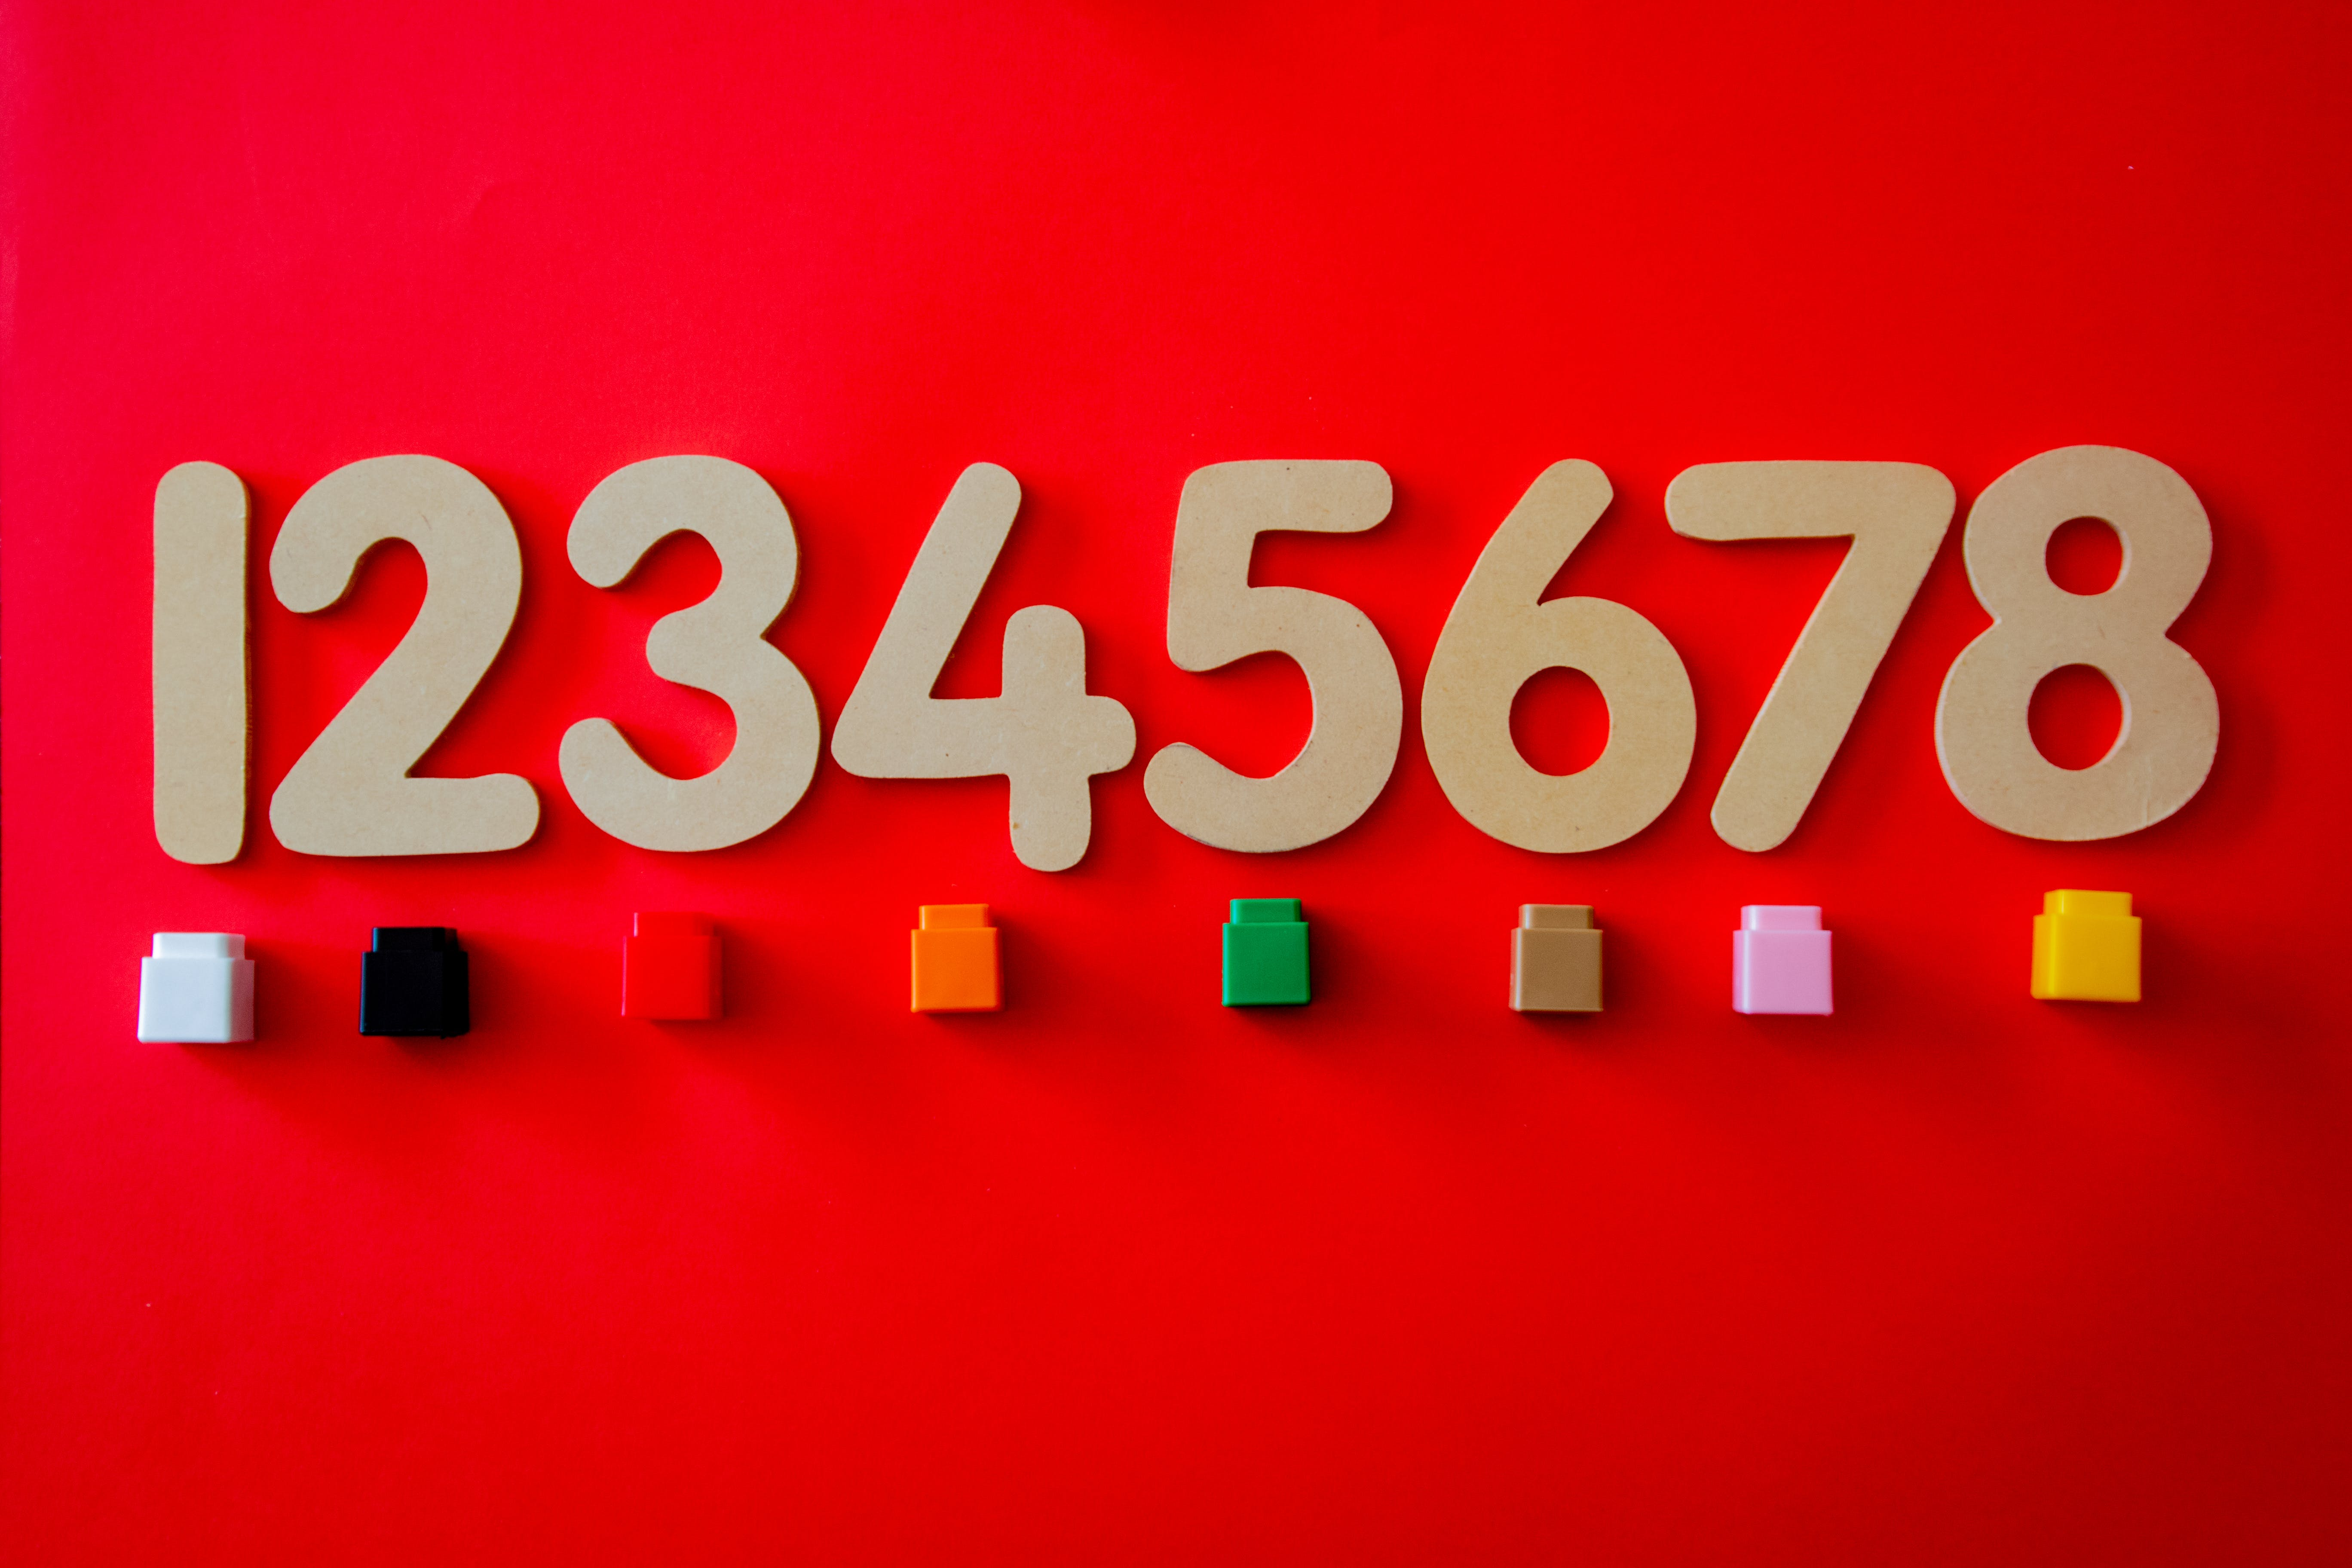 Number Cutout Decors